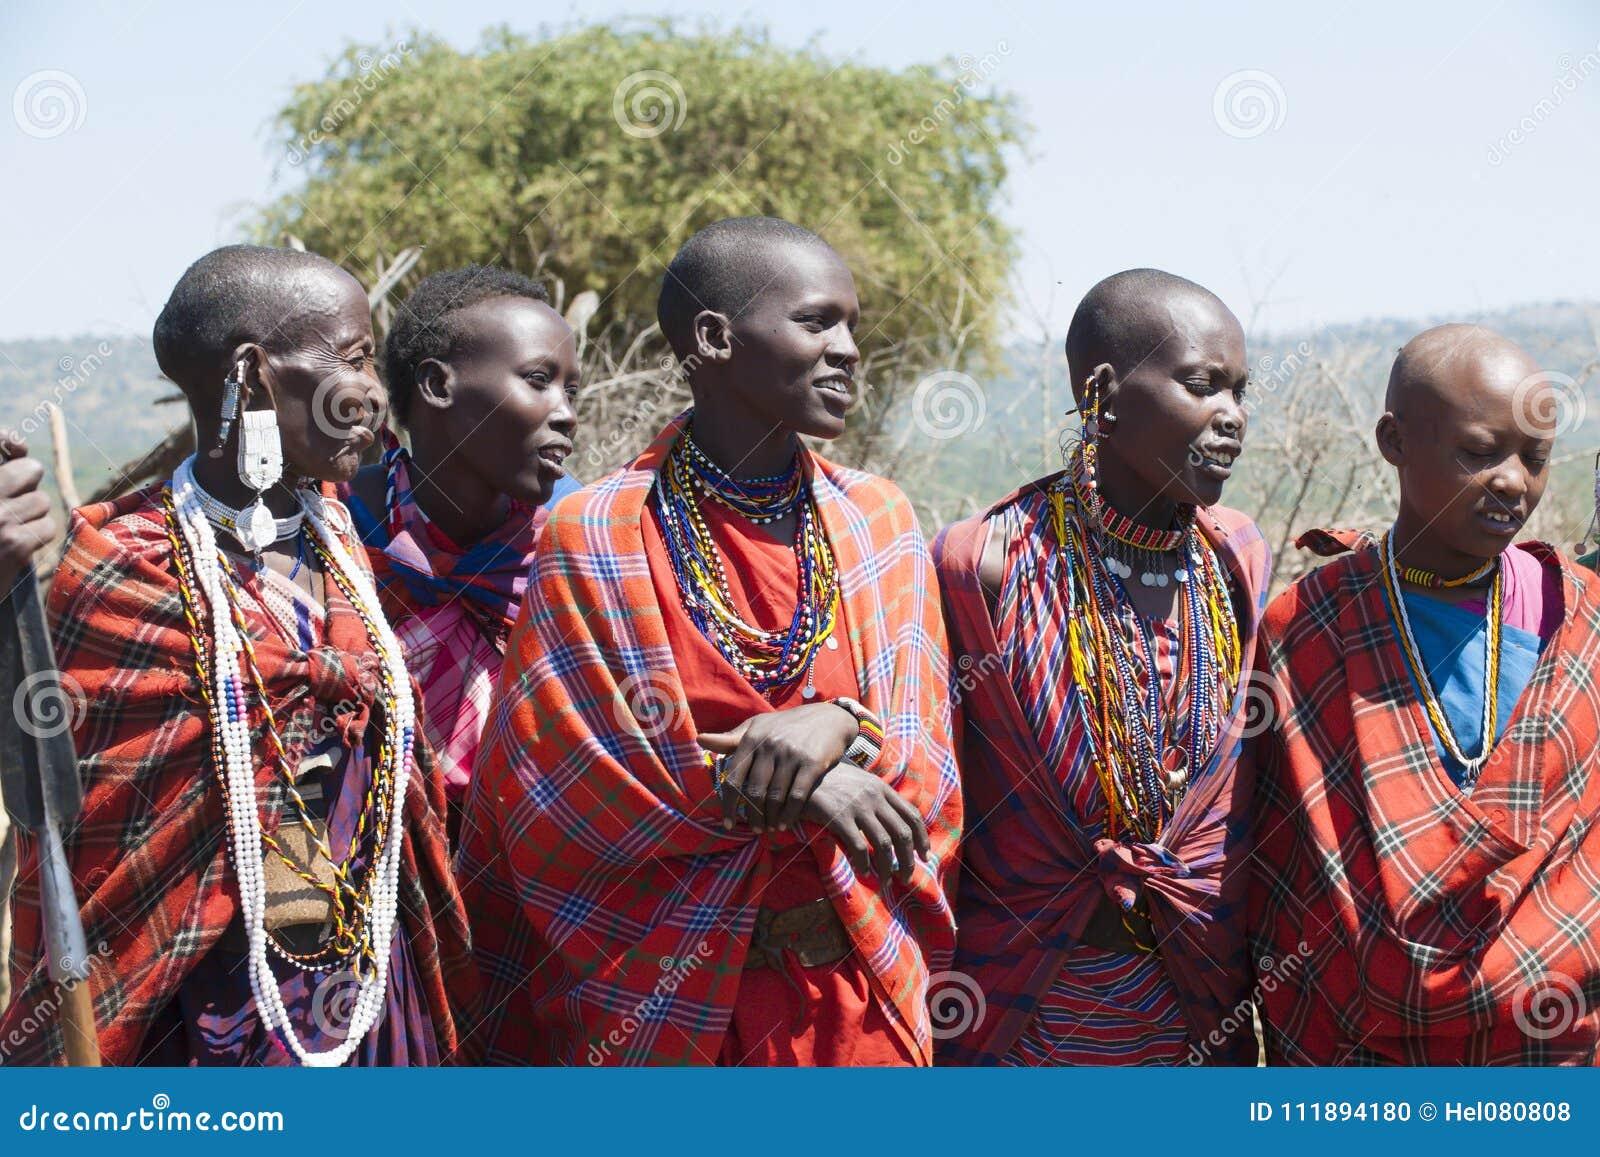 Maasai Women 161cc710ad